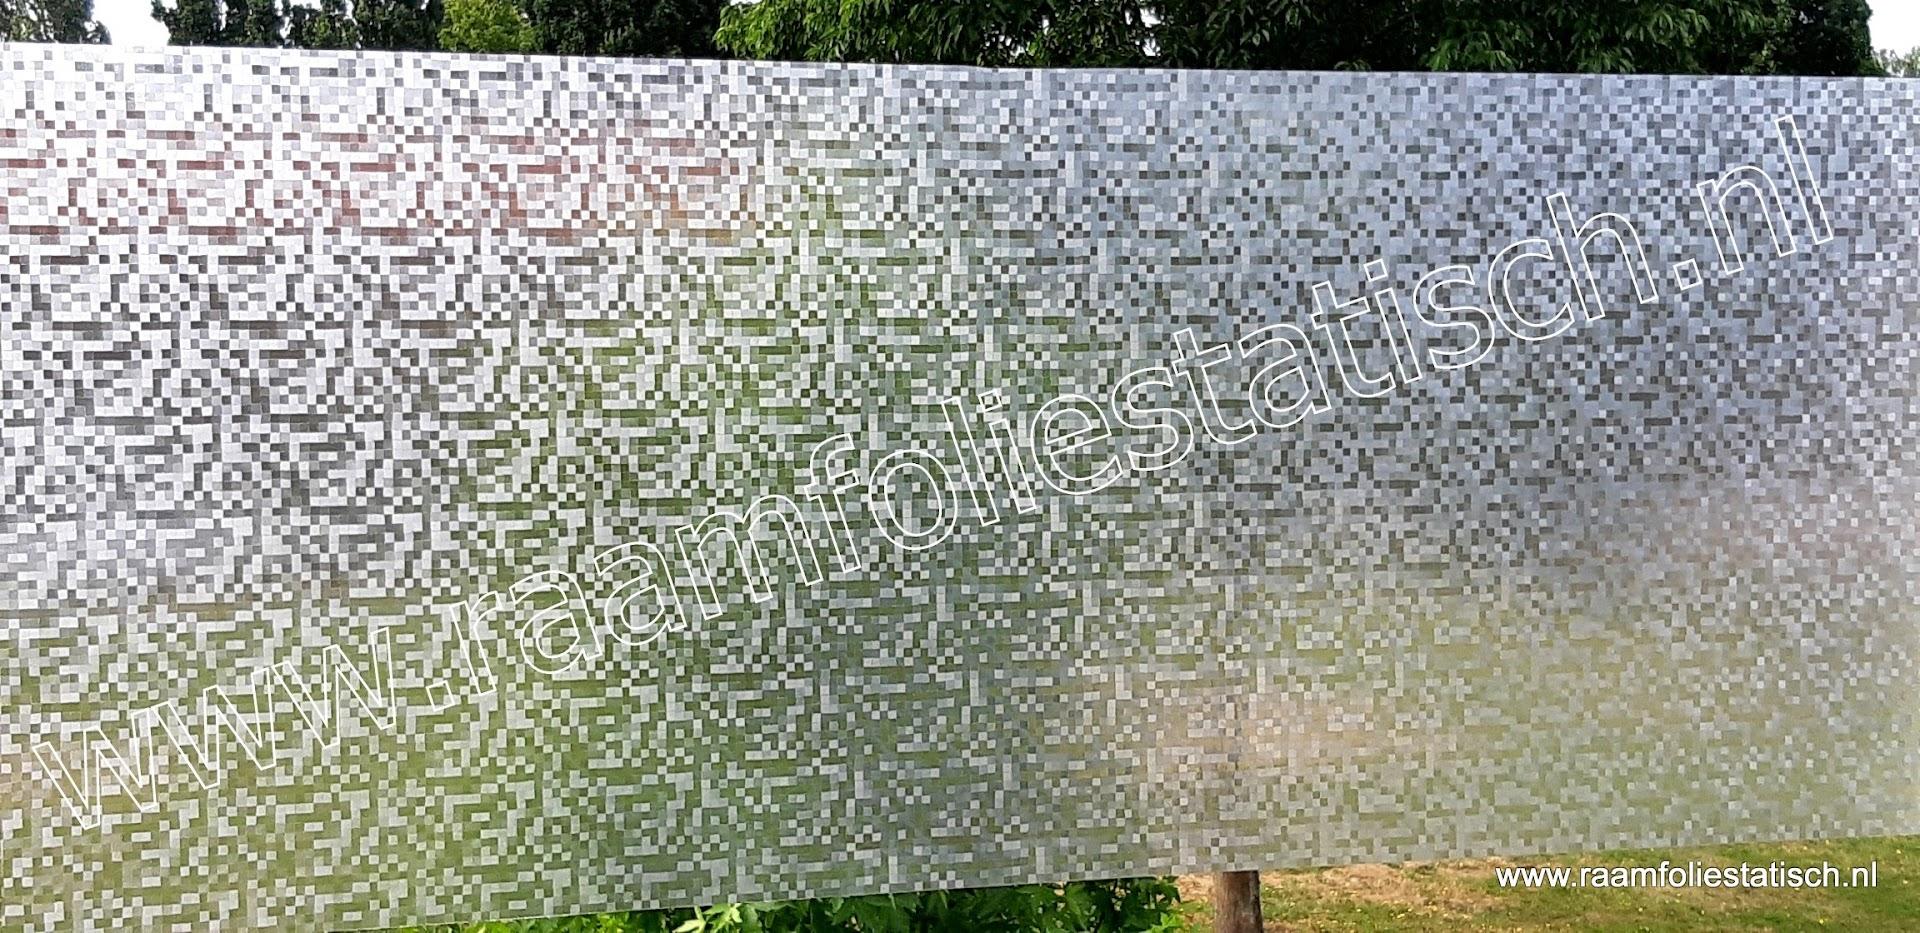 Raamfolie Blokjes 0,5cm